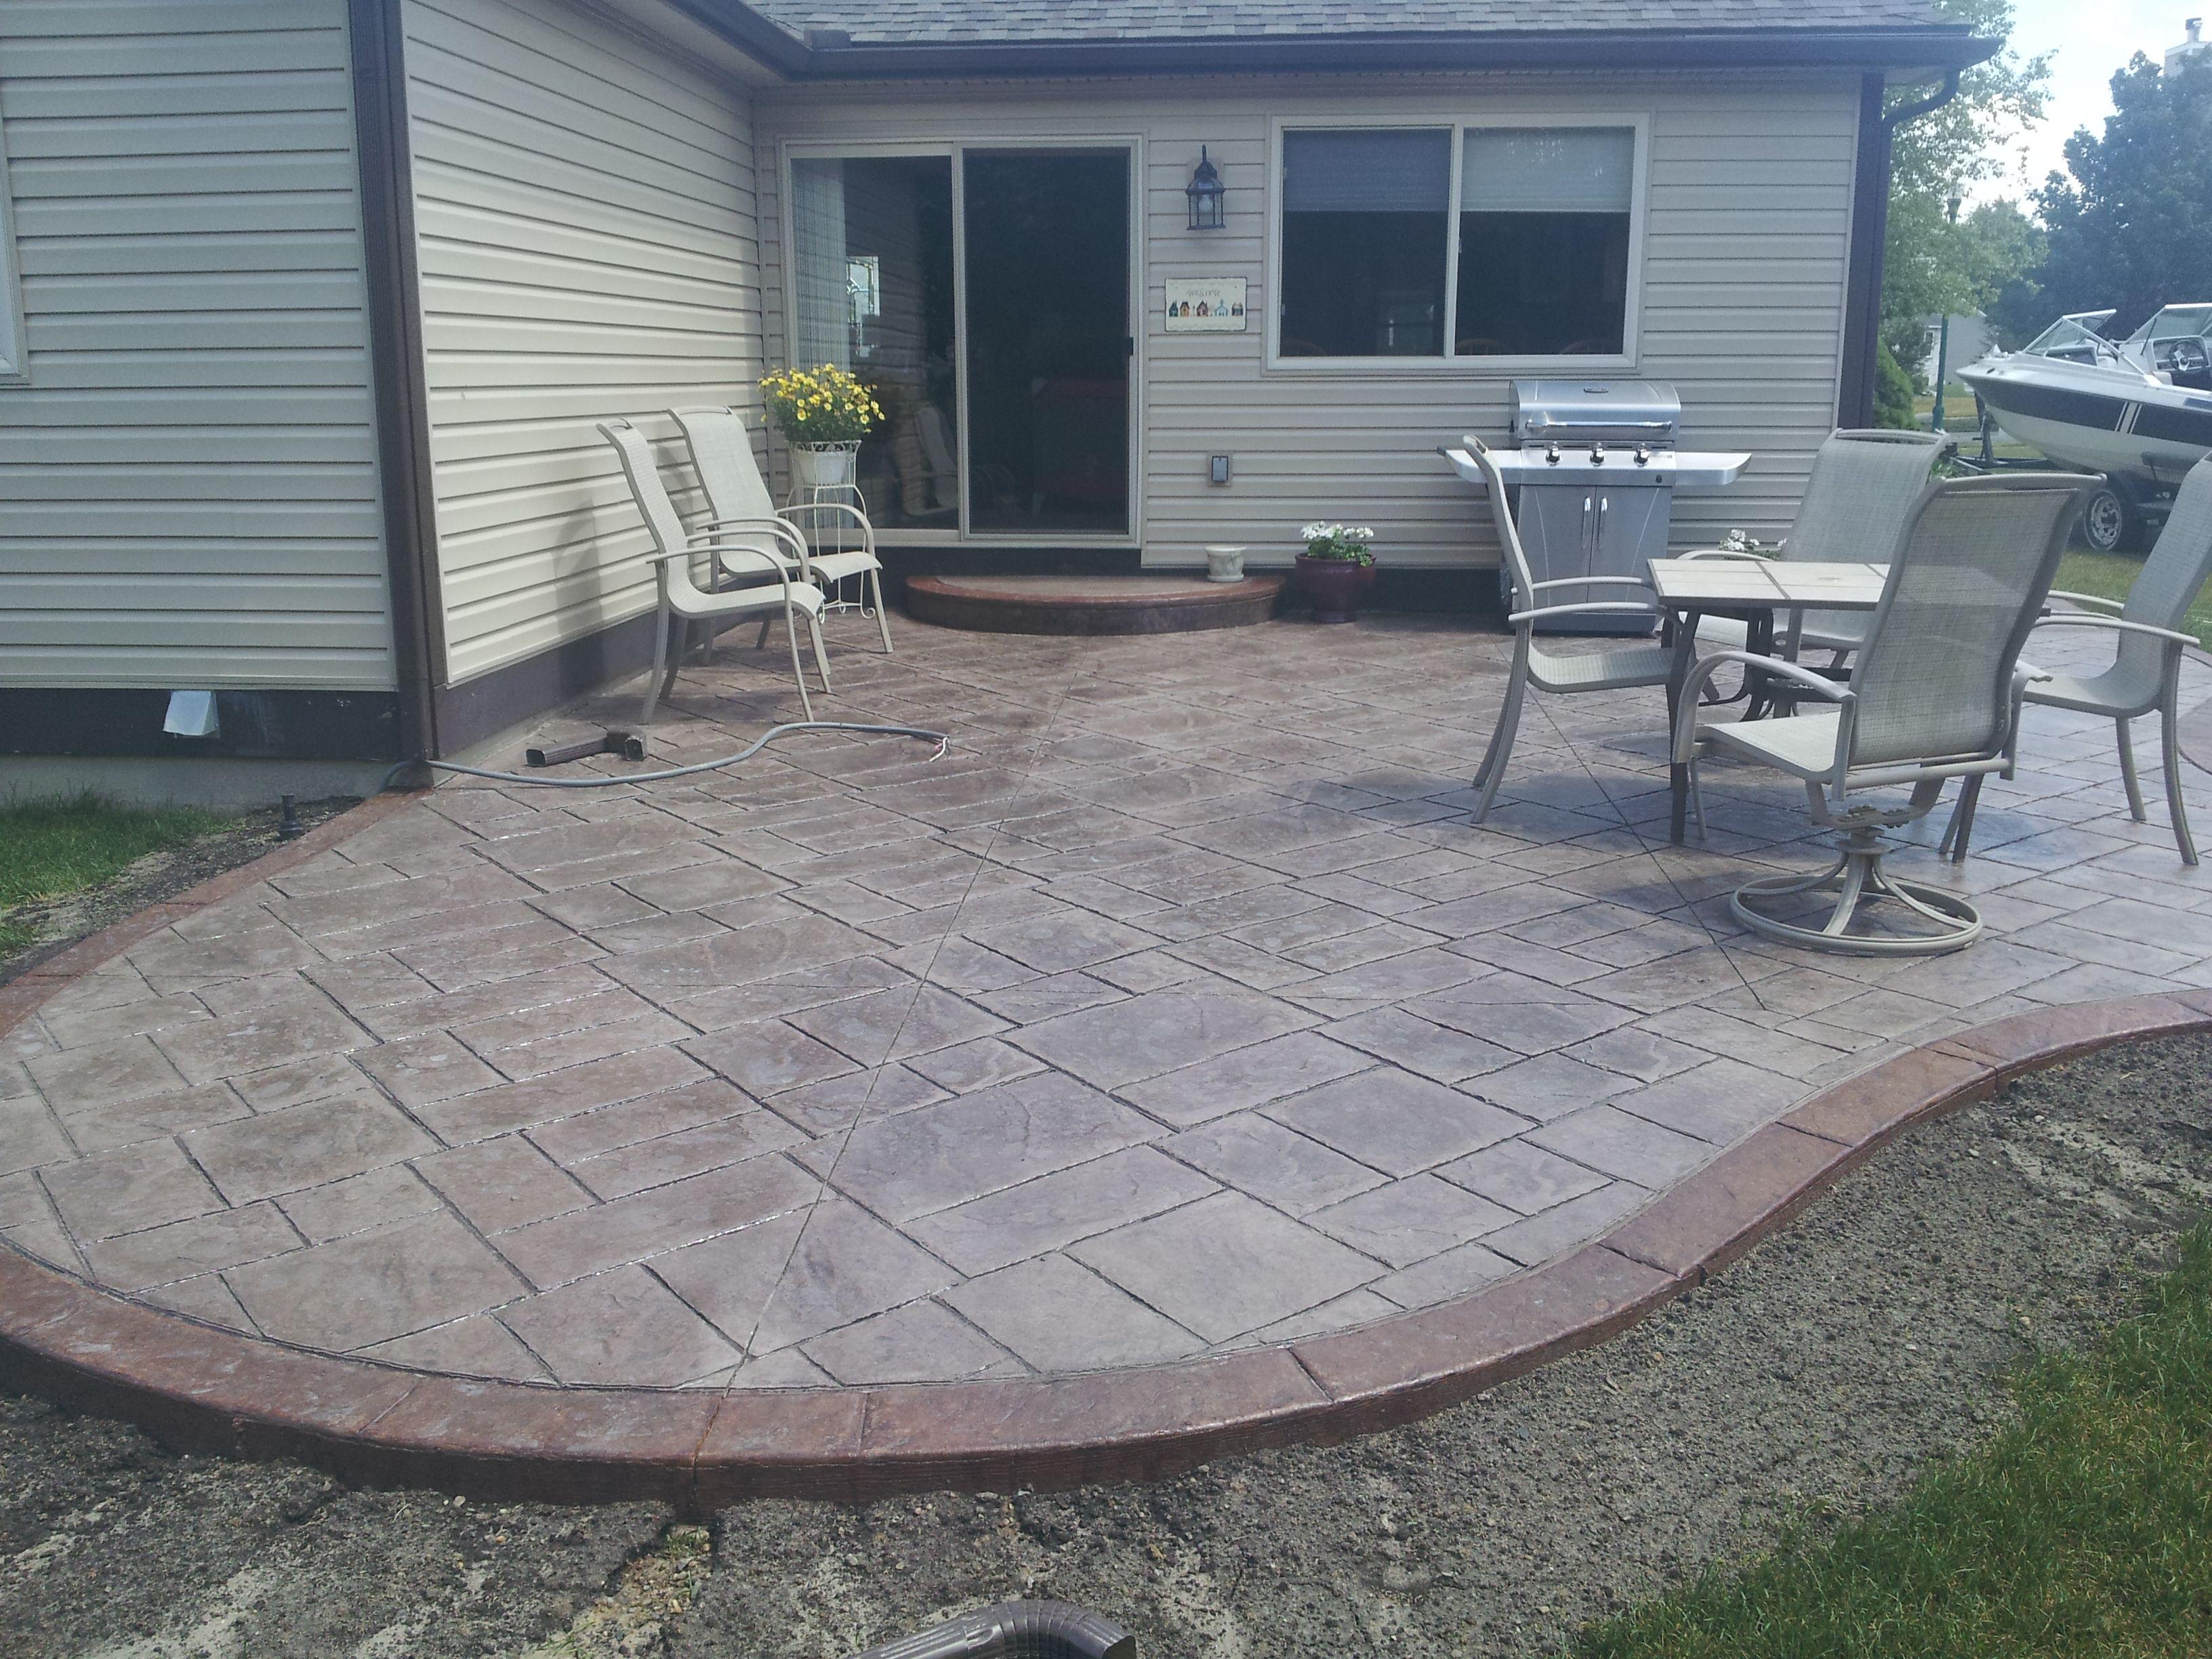 concrete patio design ideas | Patio Designs | Pinterest ...